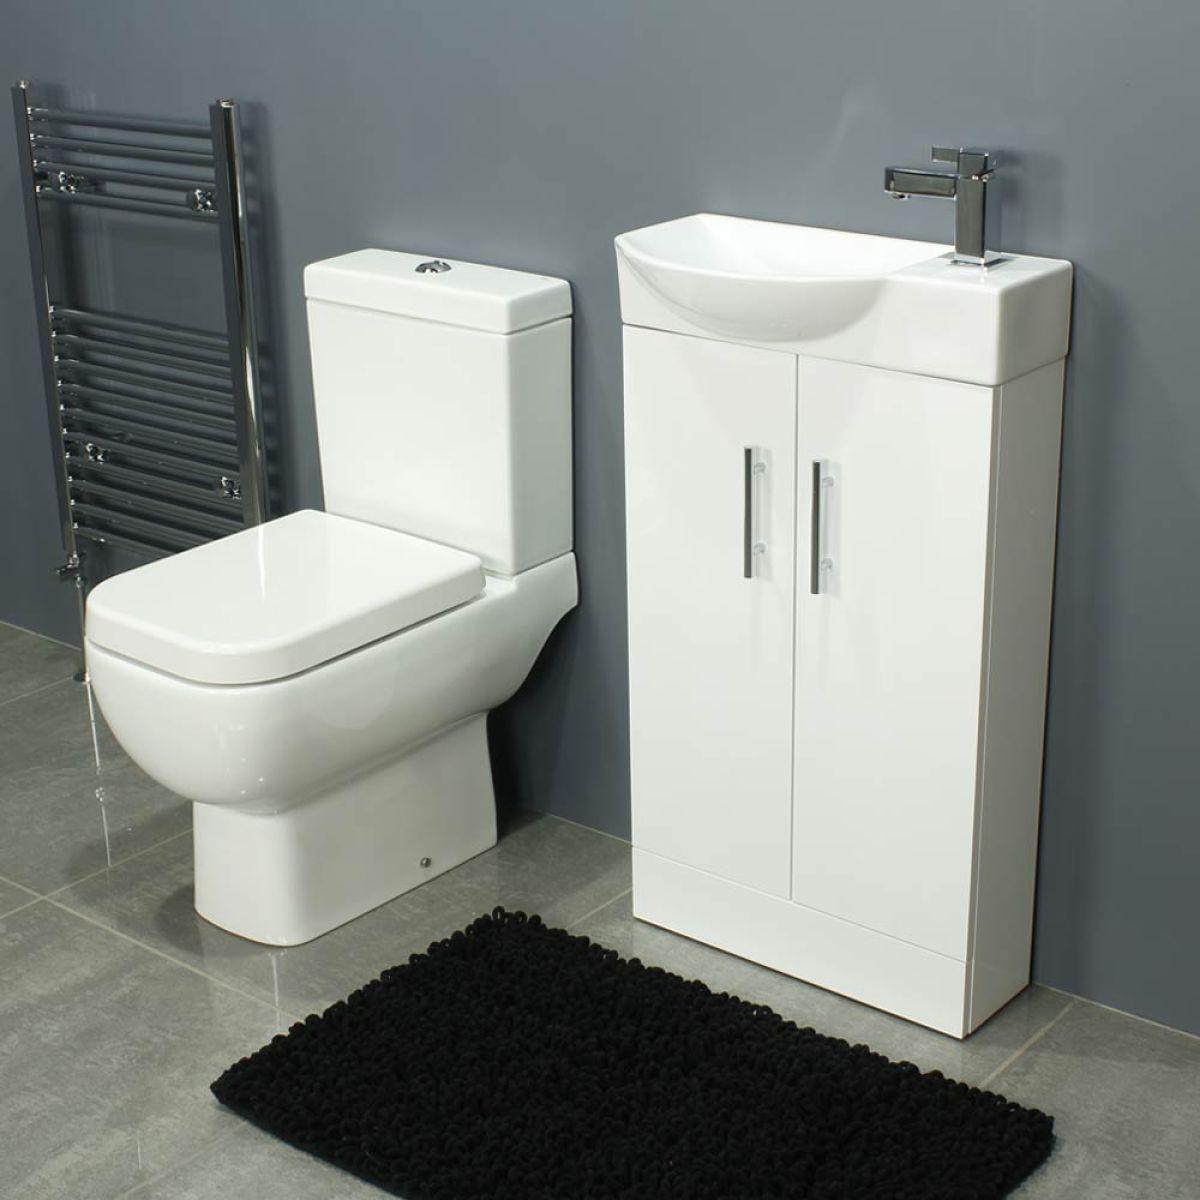 RAK Series 600 Close Coupled Toilet and 500 Series Gloss White Mini Double Door Vanity Unit